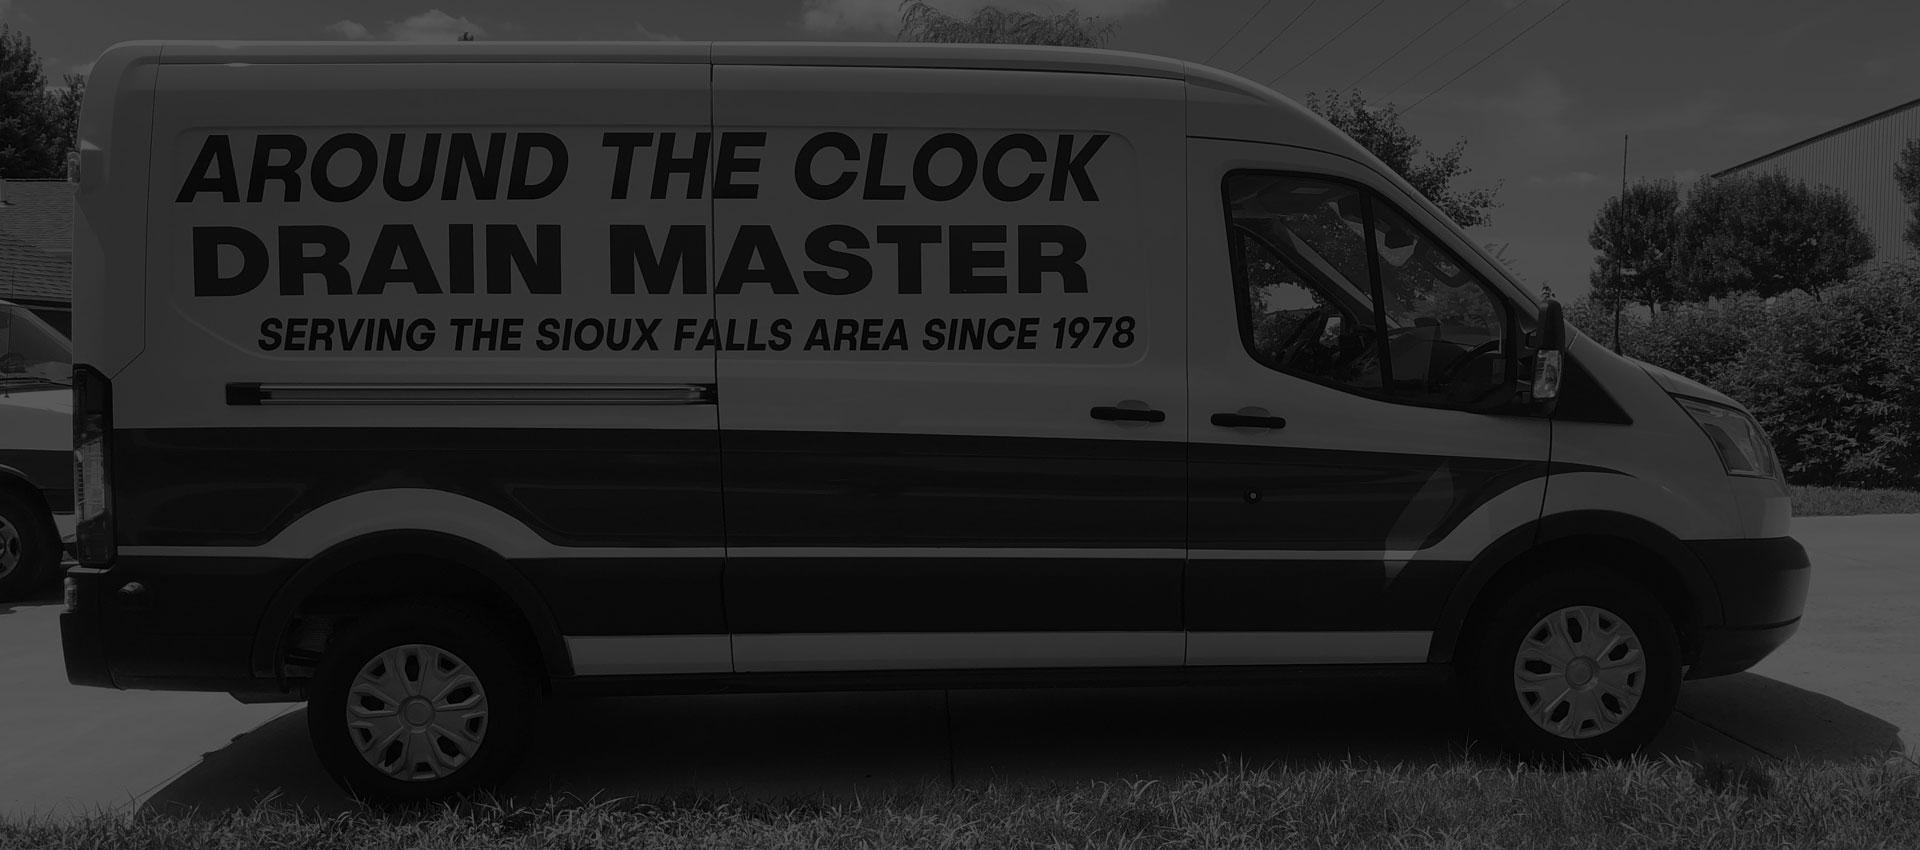 Contact Around the Clock Drain Master